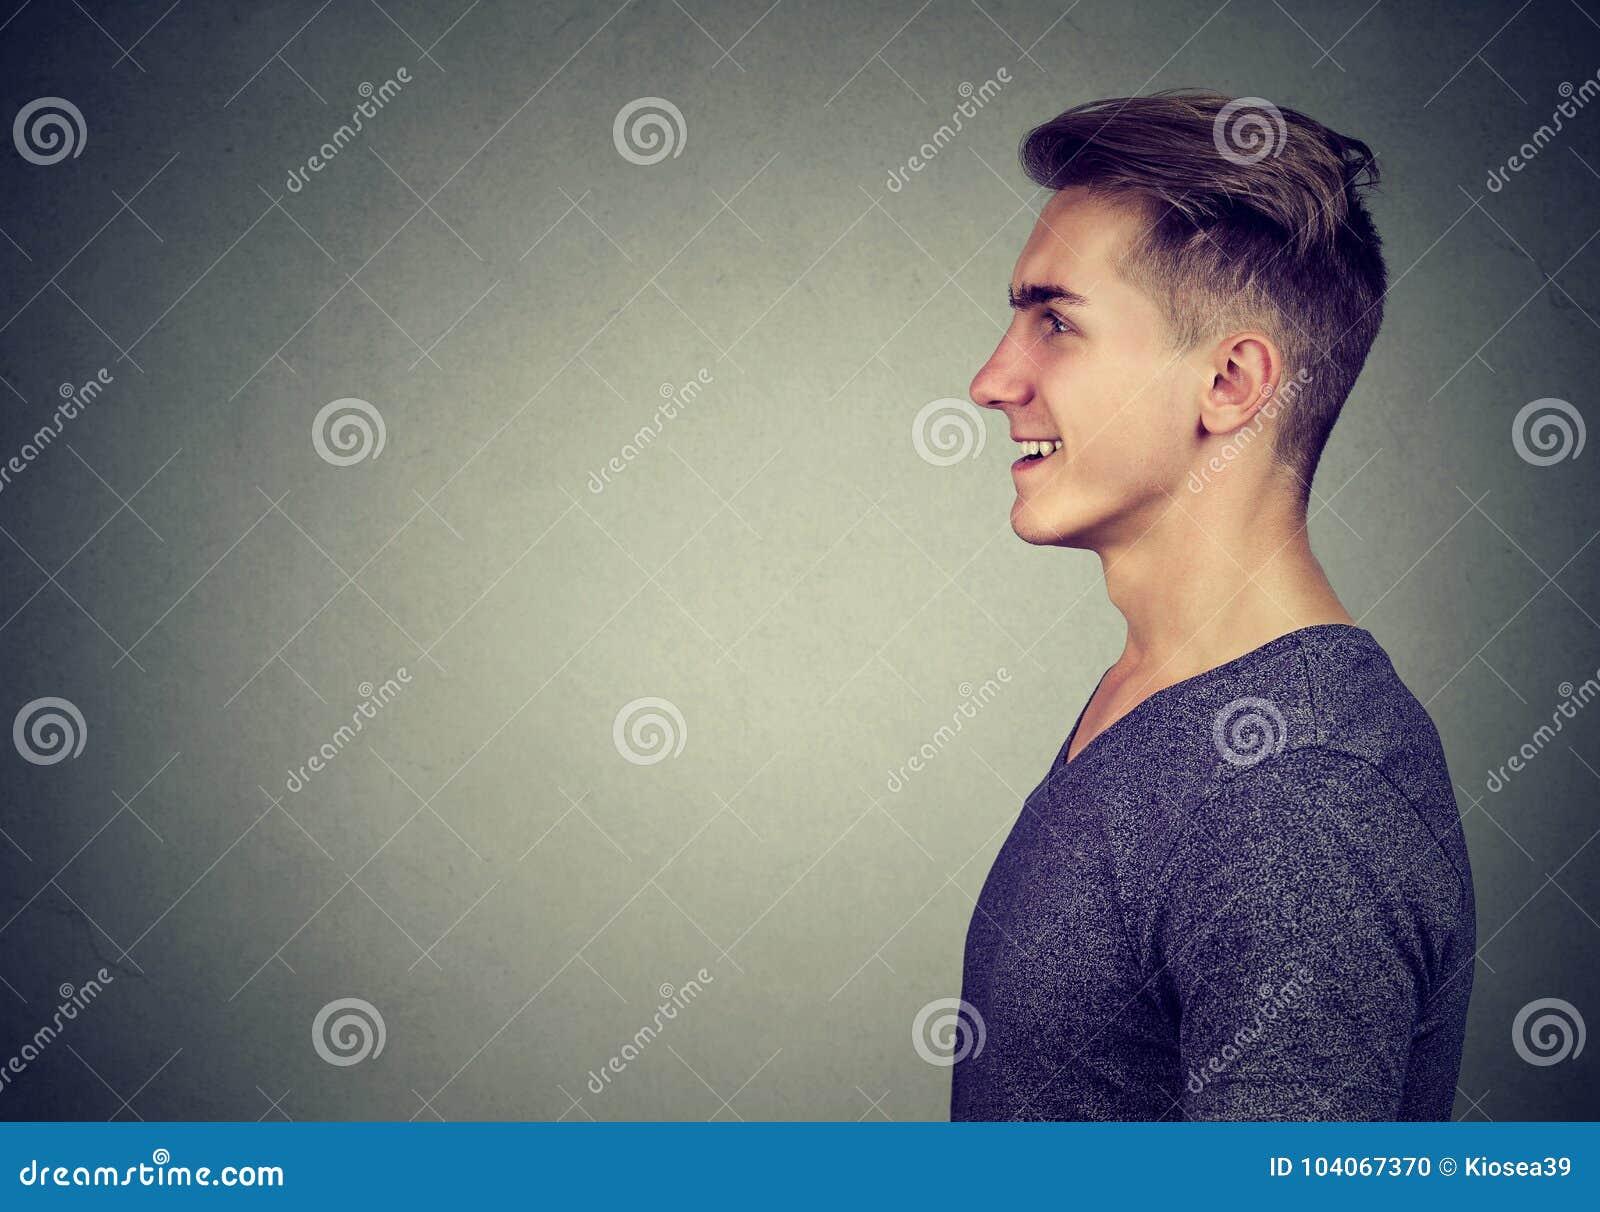 Retrato lateral del perfil de una risa feliz del hombre